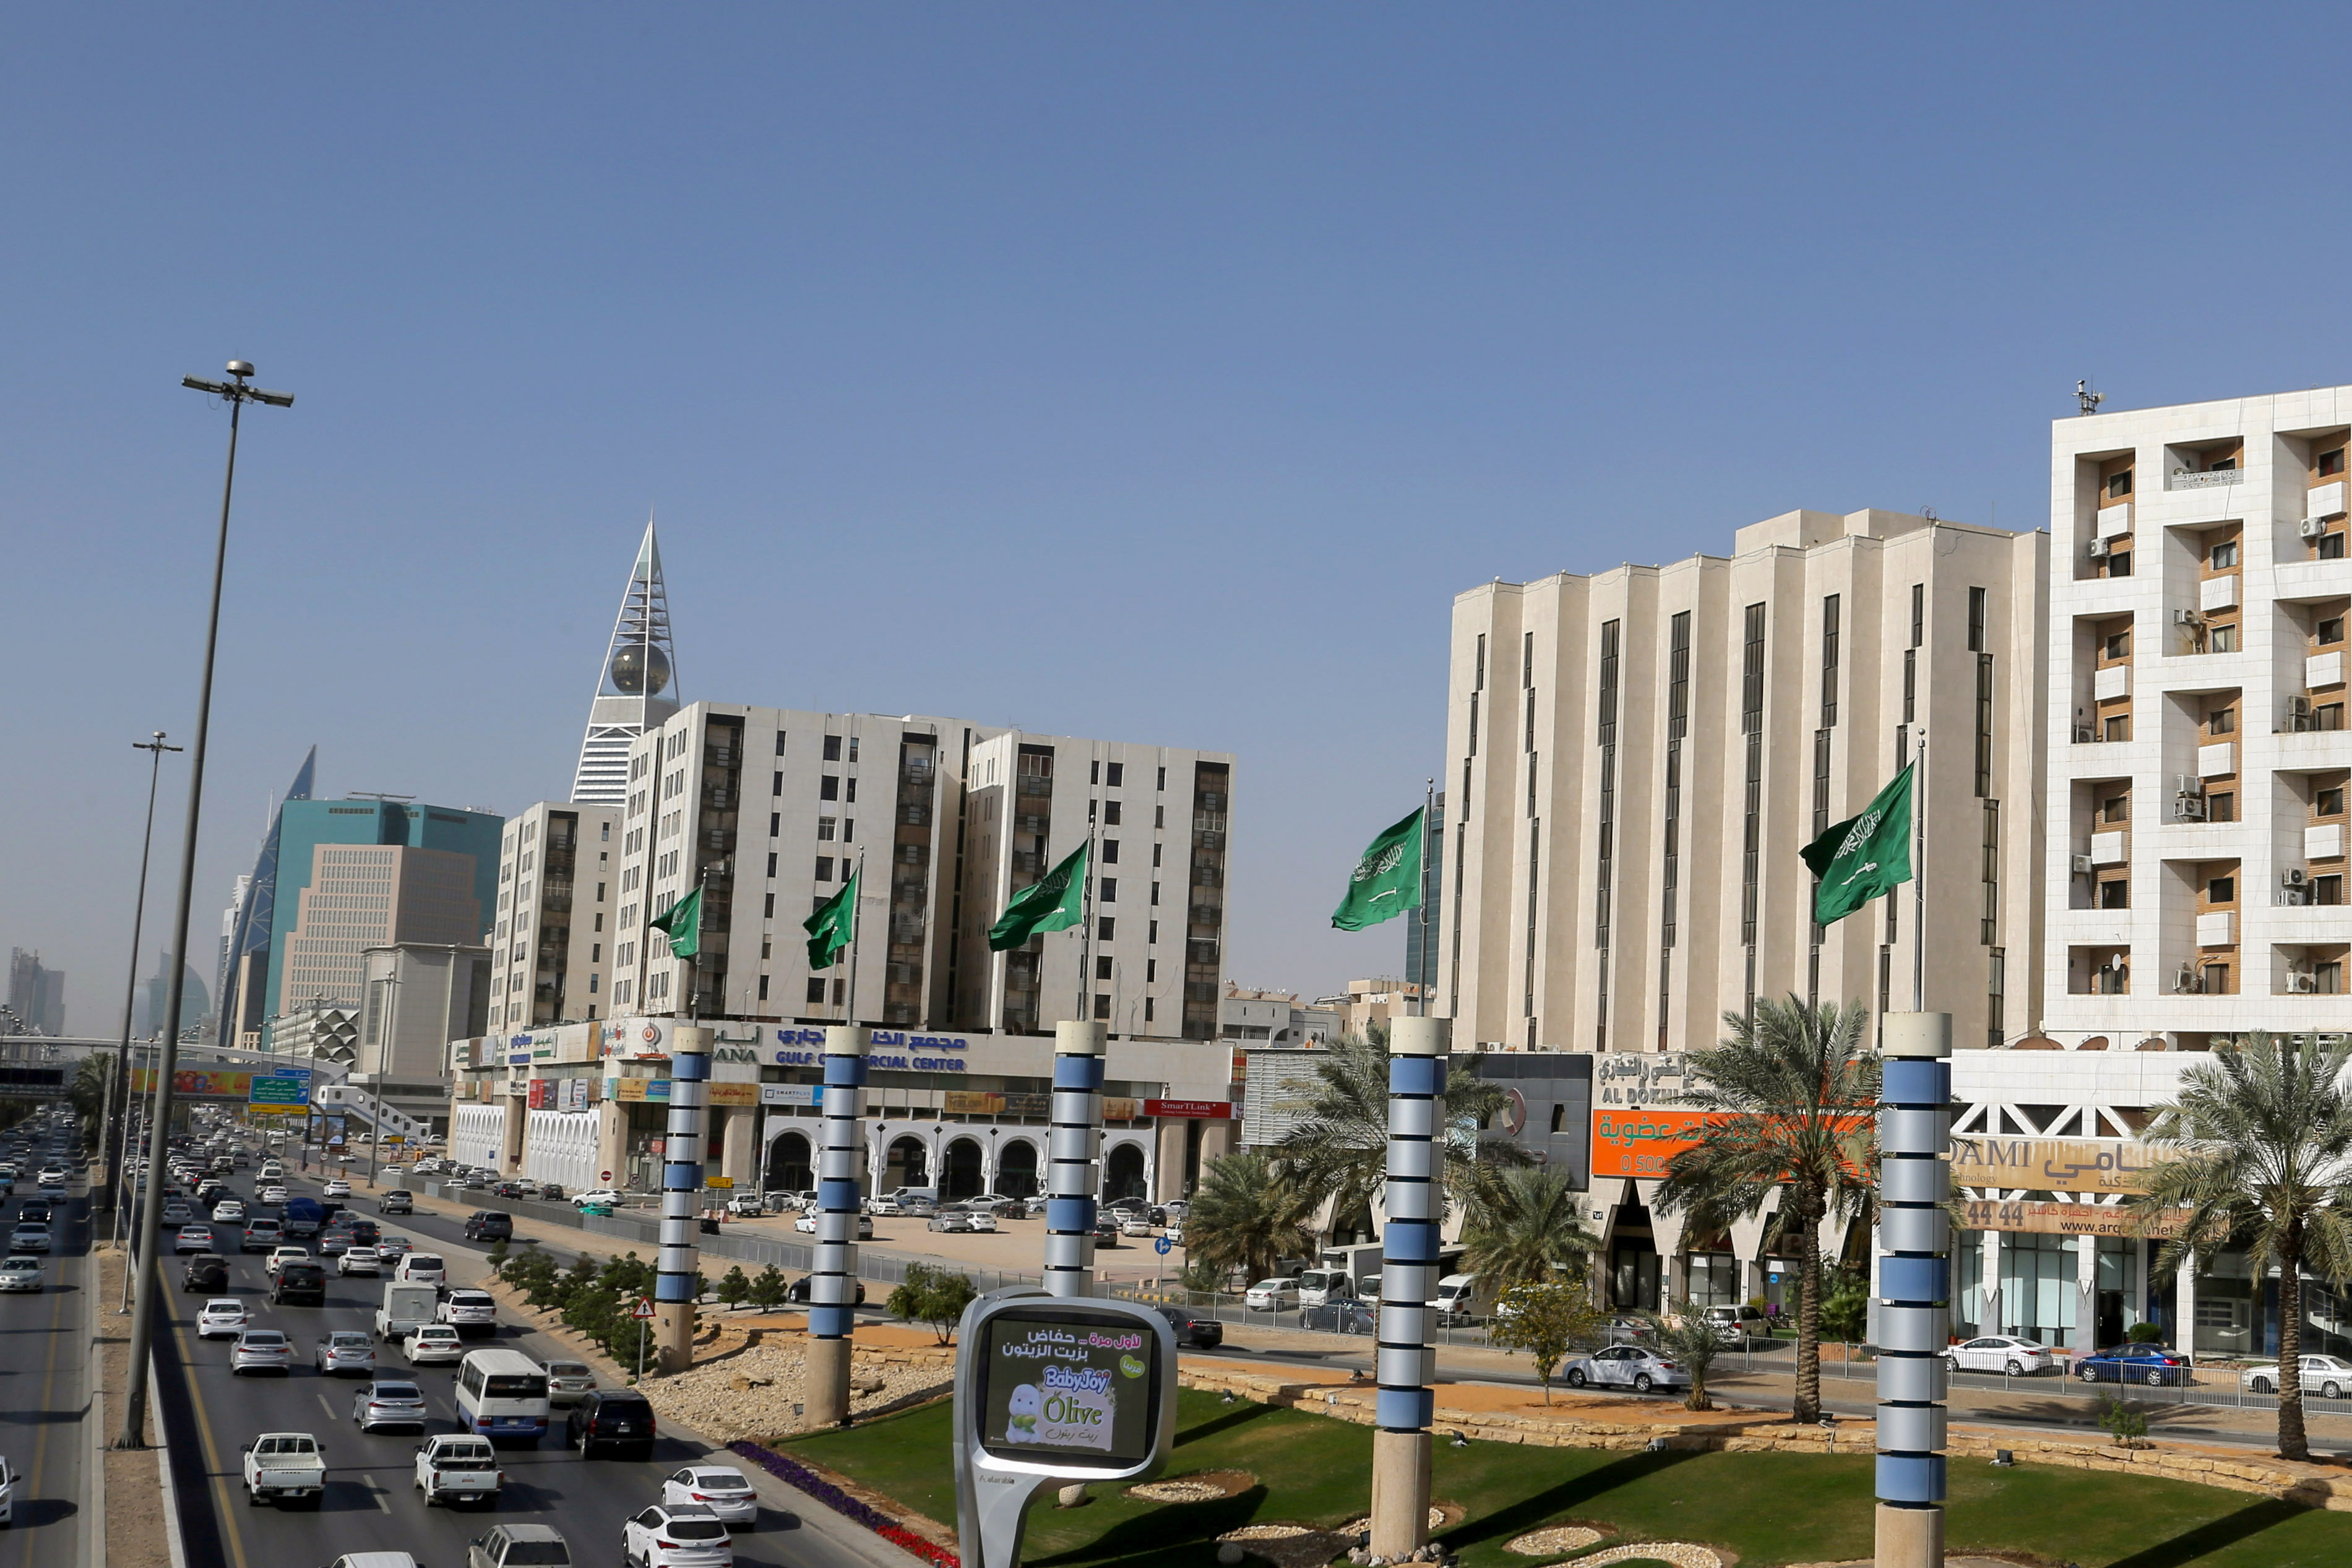 A view shows vehicles driving on a street in Riyadh, Saudi Arabia February 16, 2021. REUTERS/Ahmed Yosri/File Photo